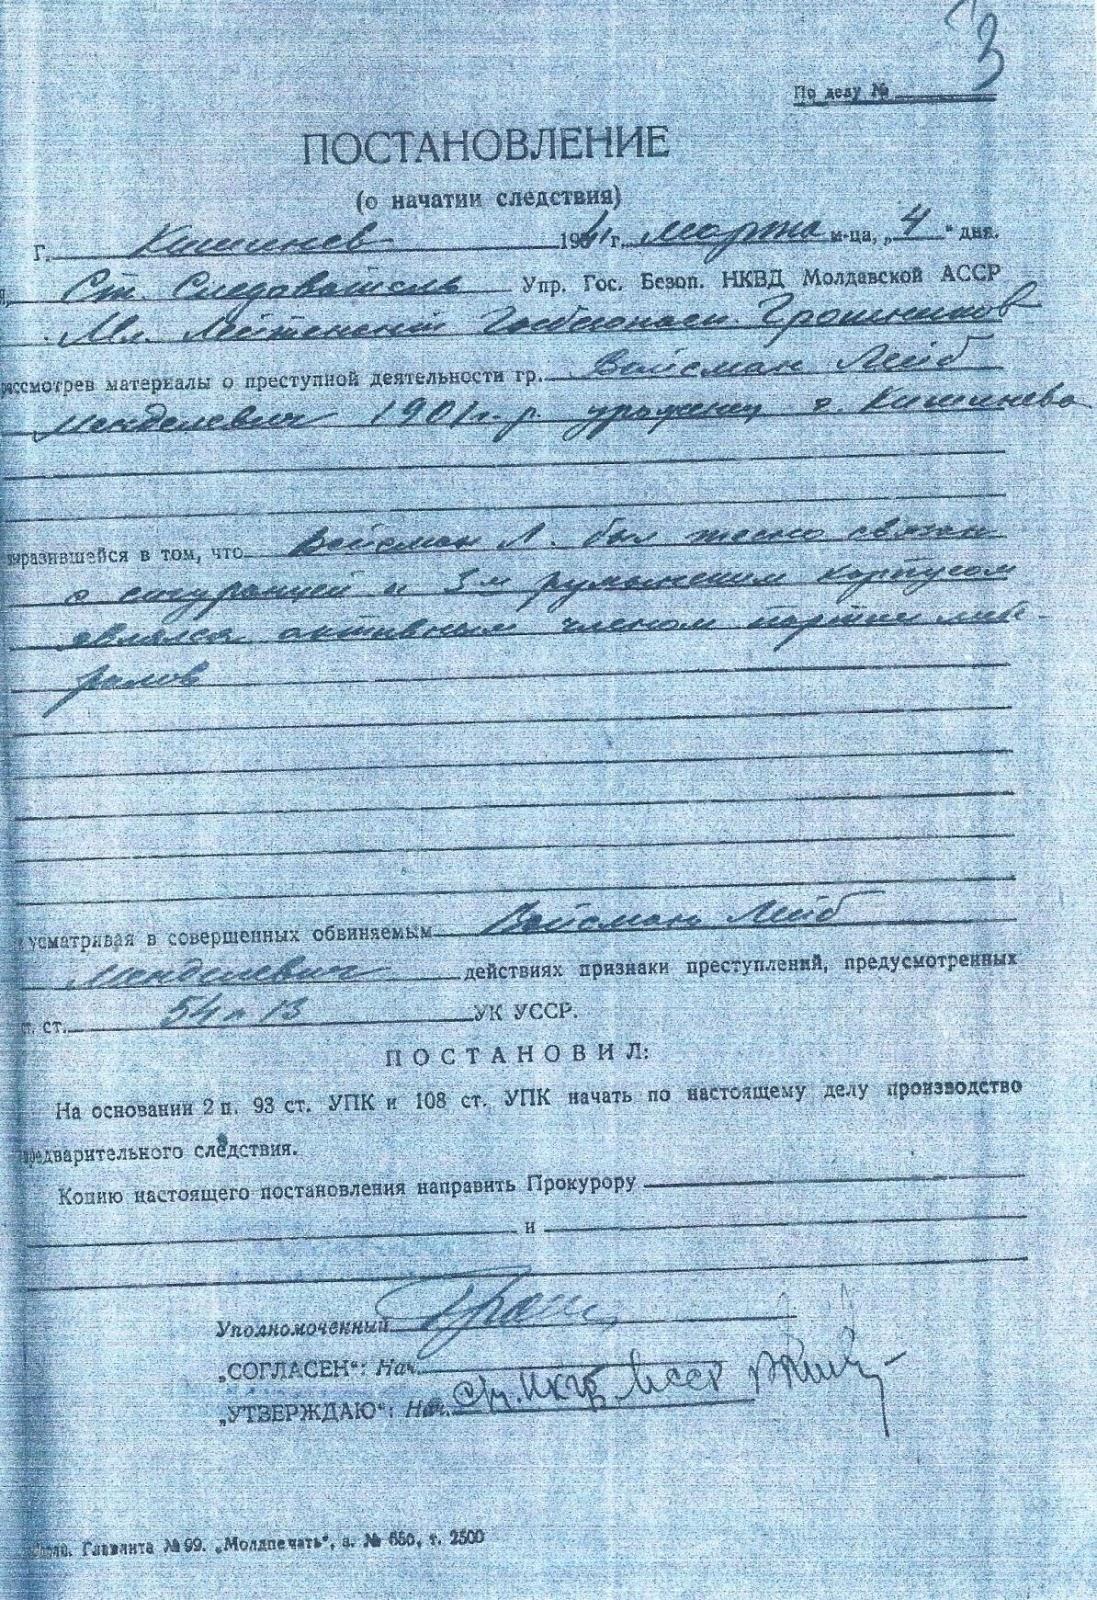 C:\Users\Ella Romm\Documents\Scanned Documents\Lev Vaysman2.jpg